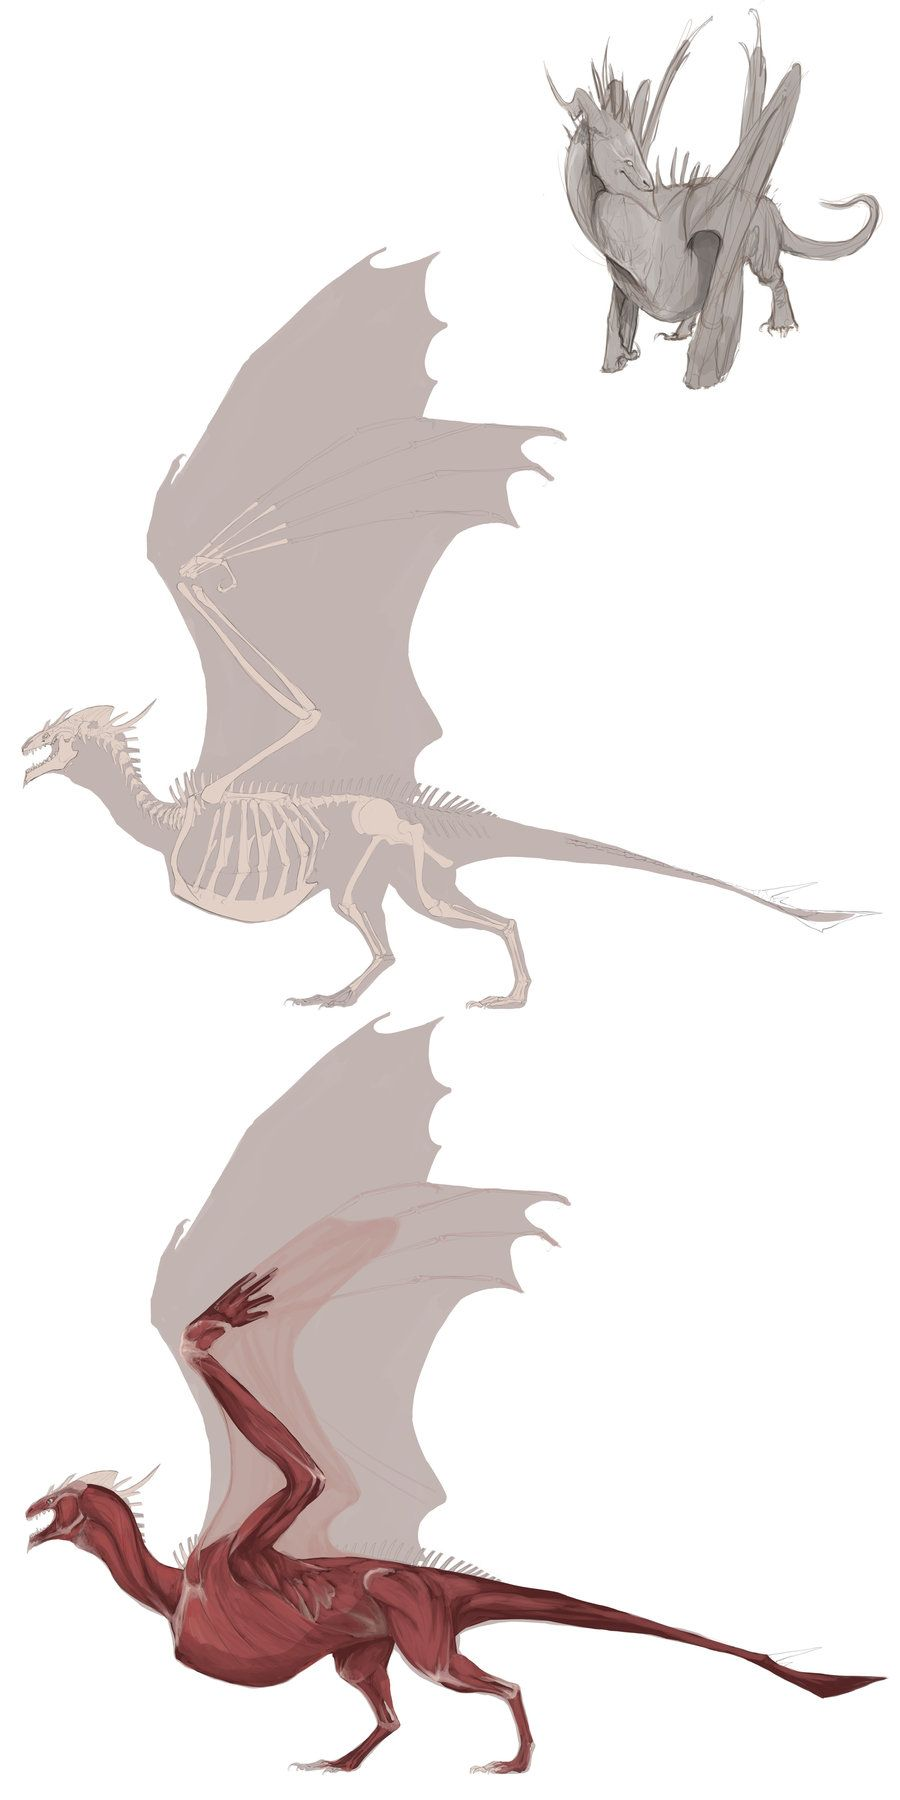 Anatomia Dragon   Concept Art / Sketch / Dibujo   Pinterest ...